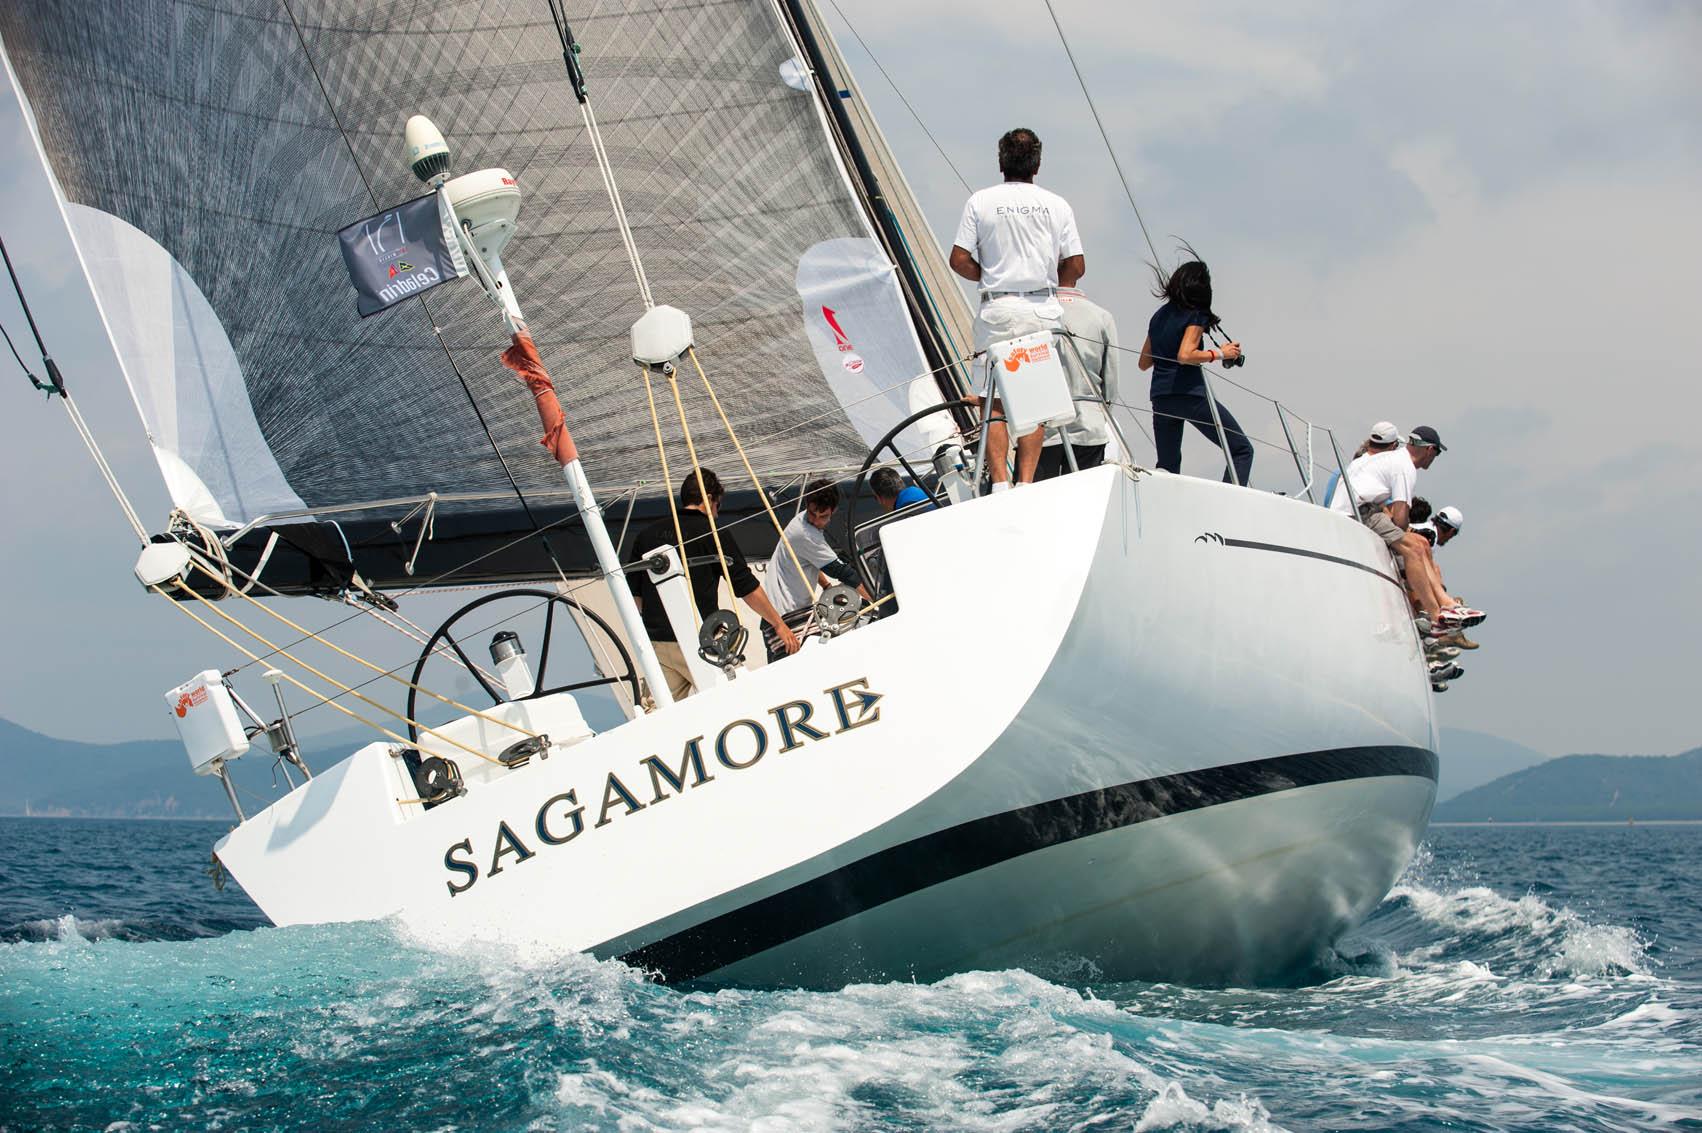 Yacht Club Repubblica Marinara Di Pisa MARE ONLINE